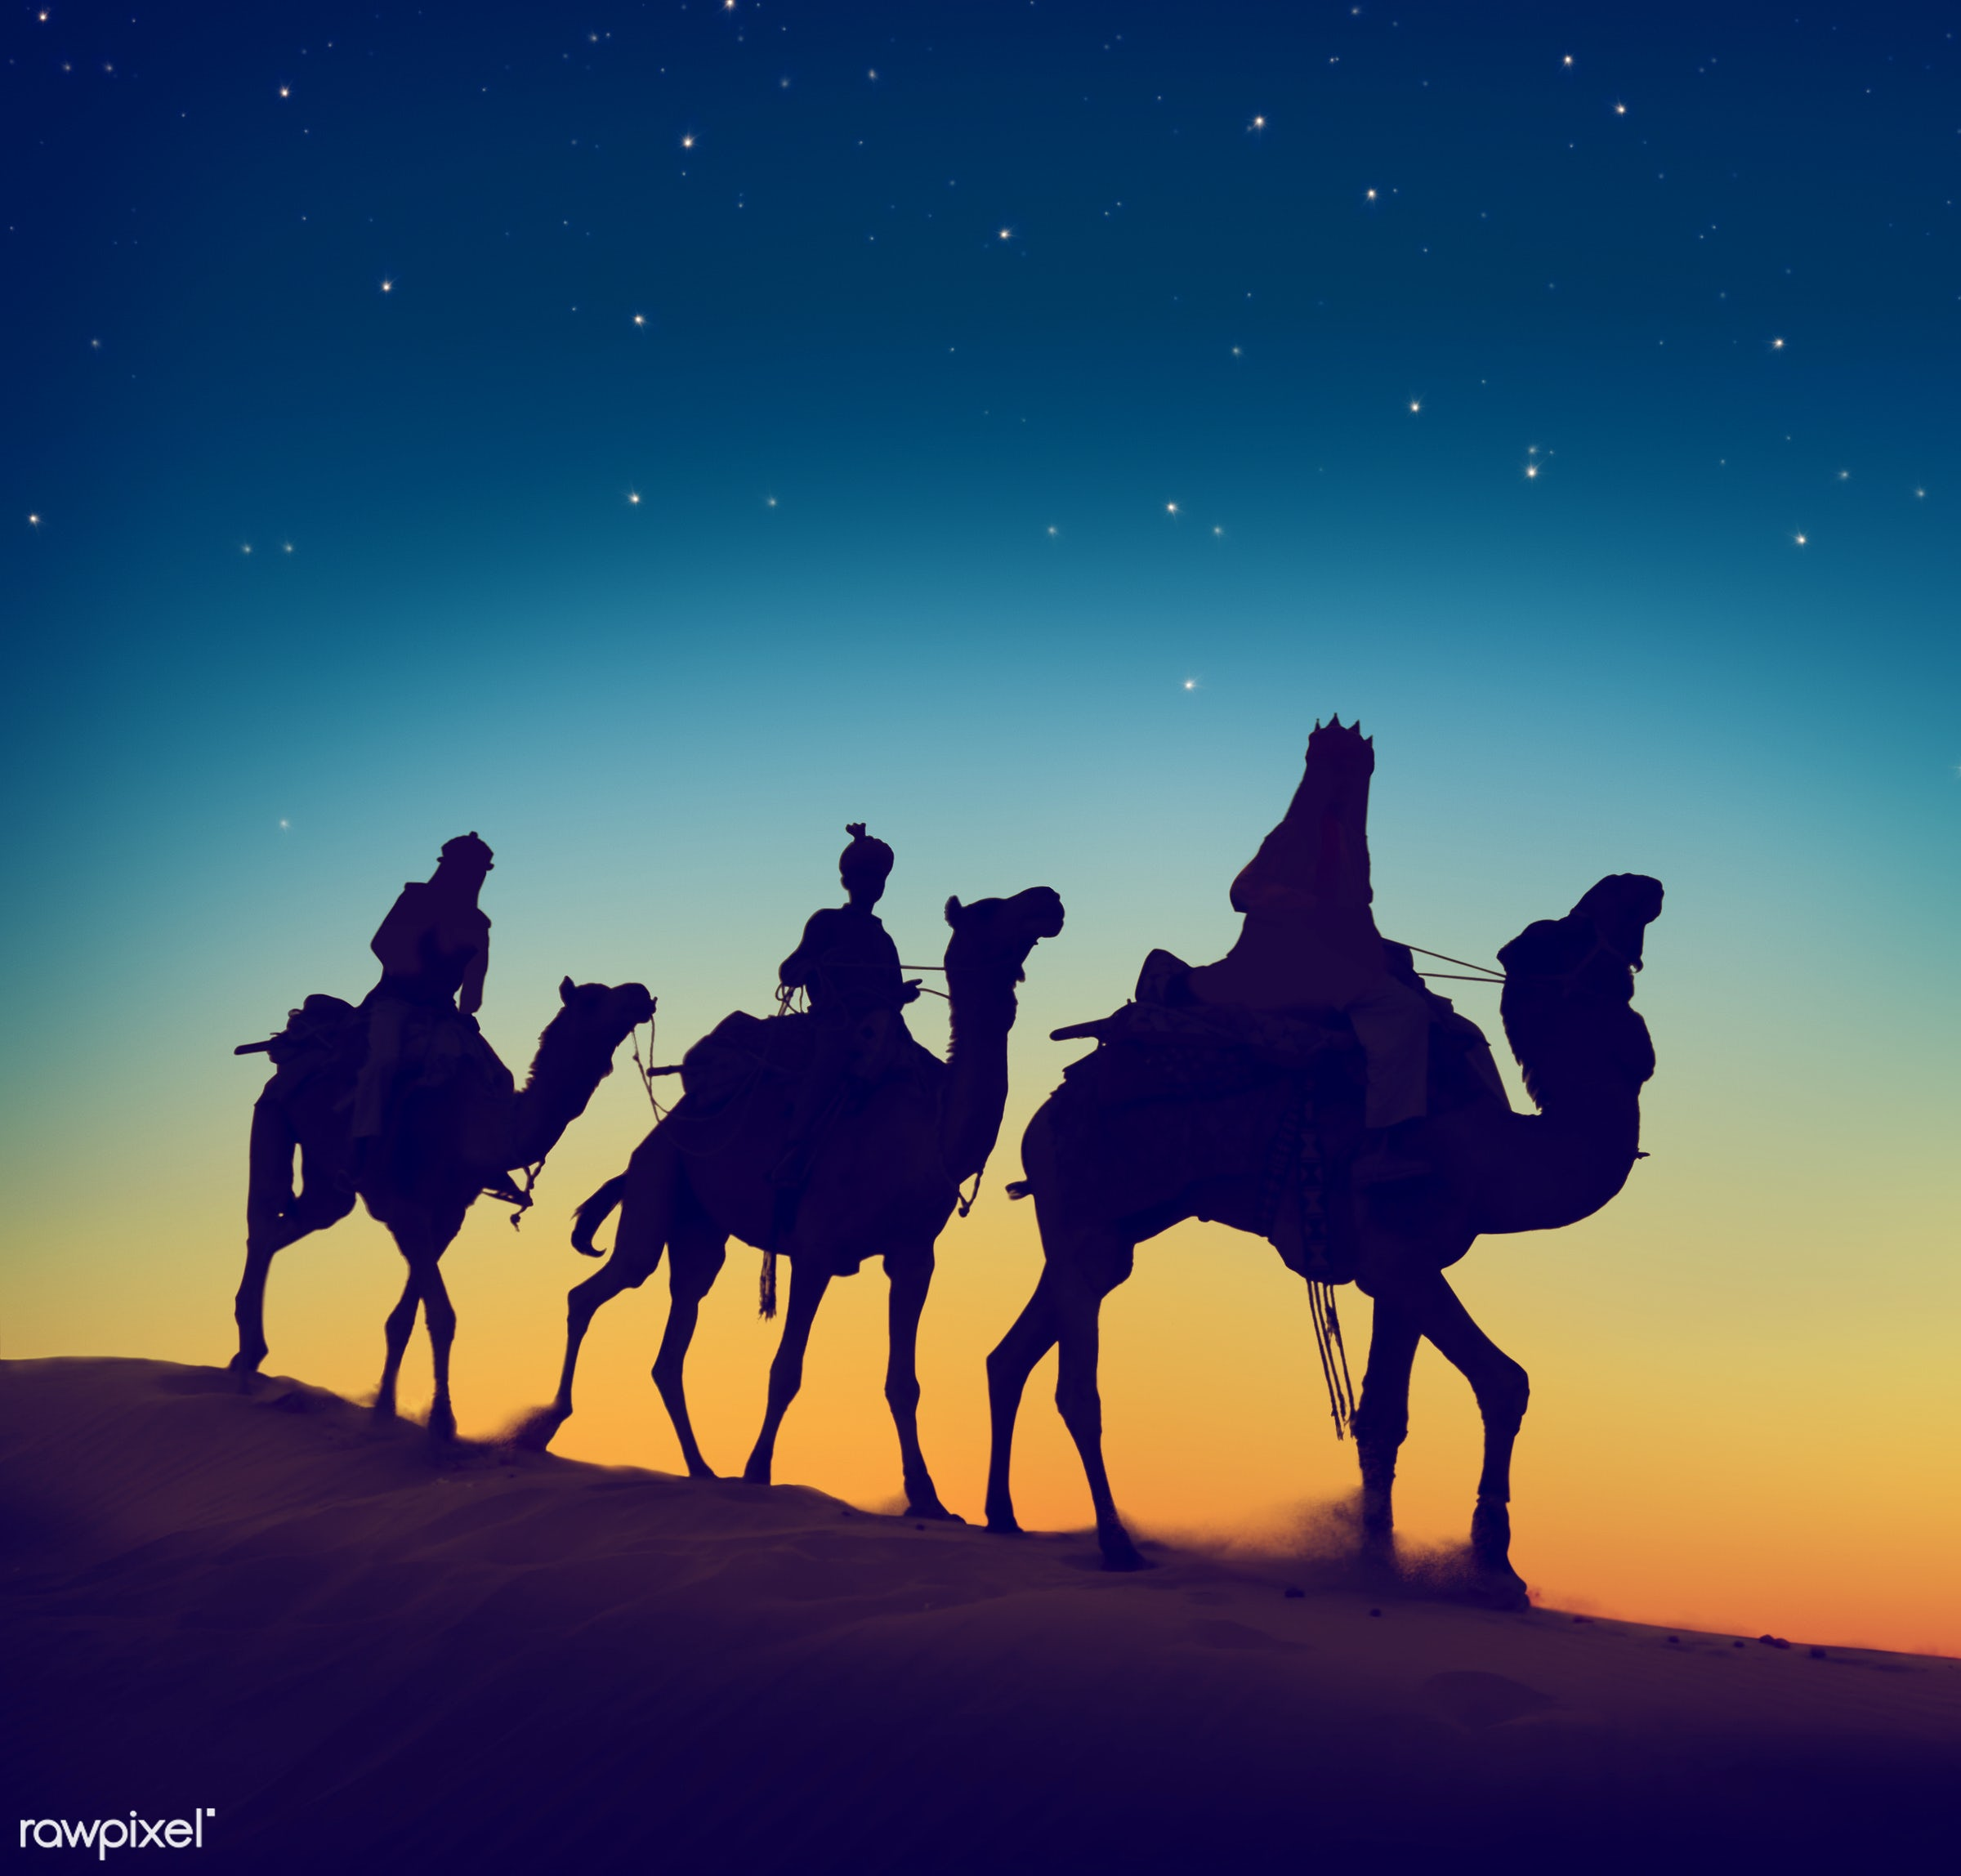 The Three Wise Men - nativity, 3 wise men, back lit, bethlehem - israel, camel, caravan, concepts, desert, destination, dusk...